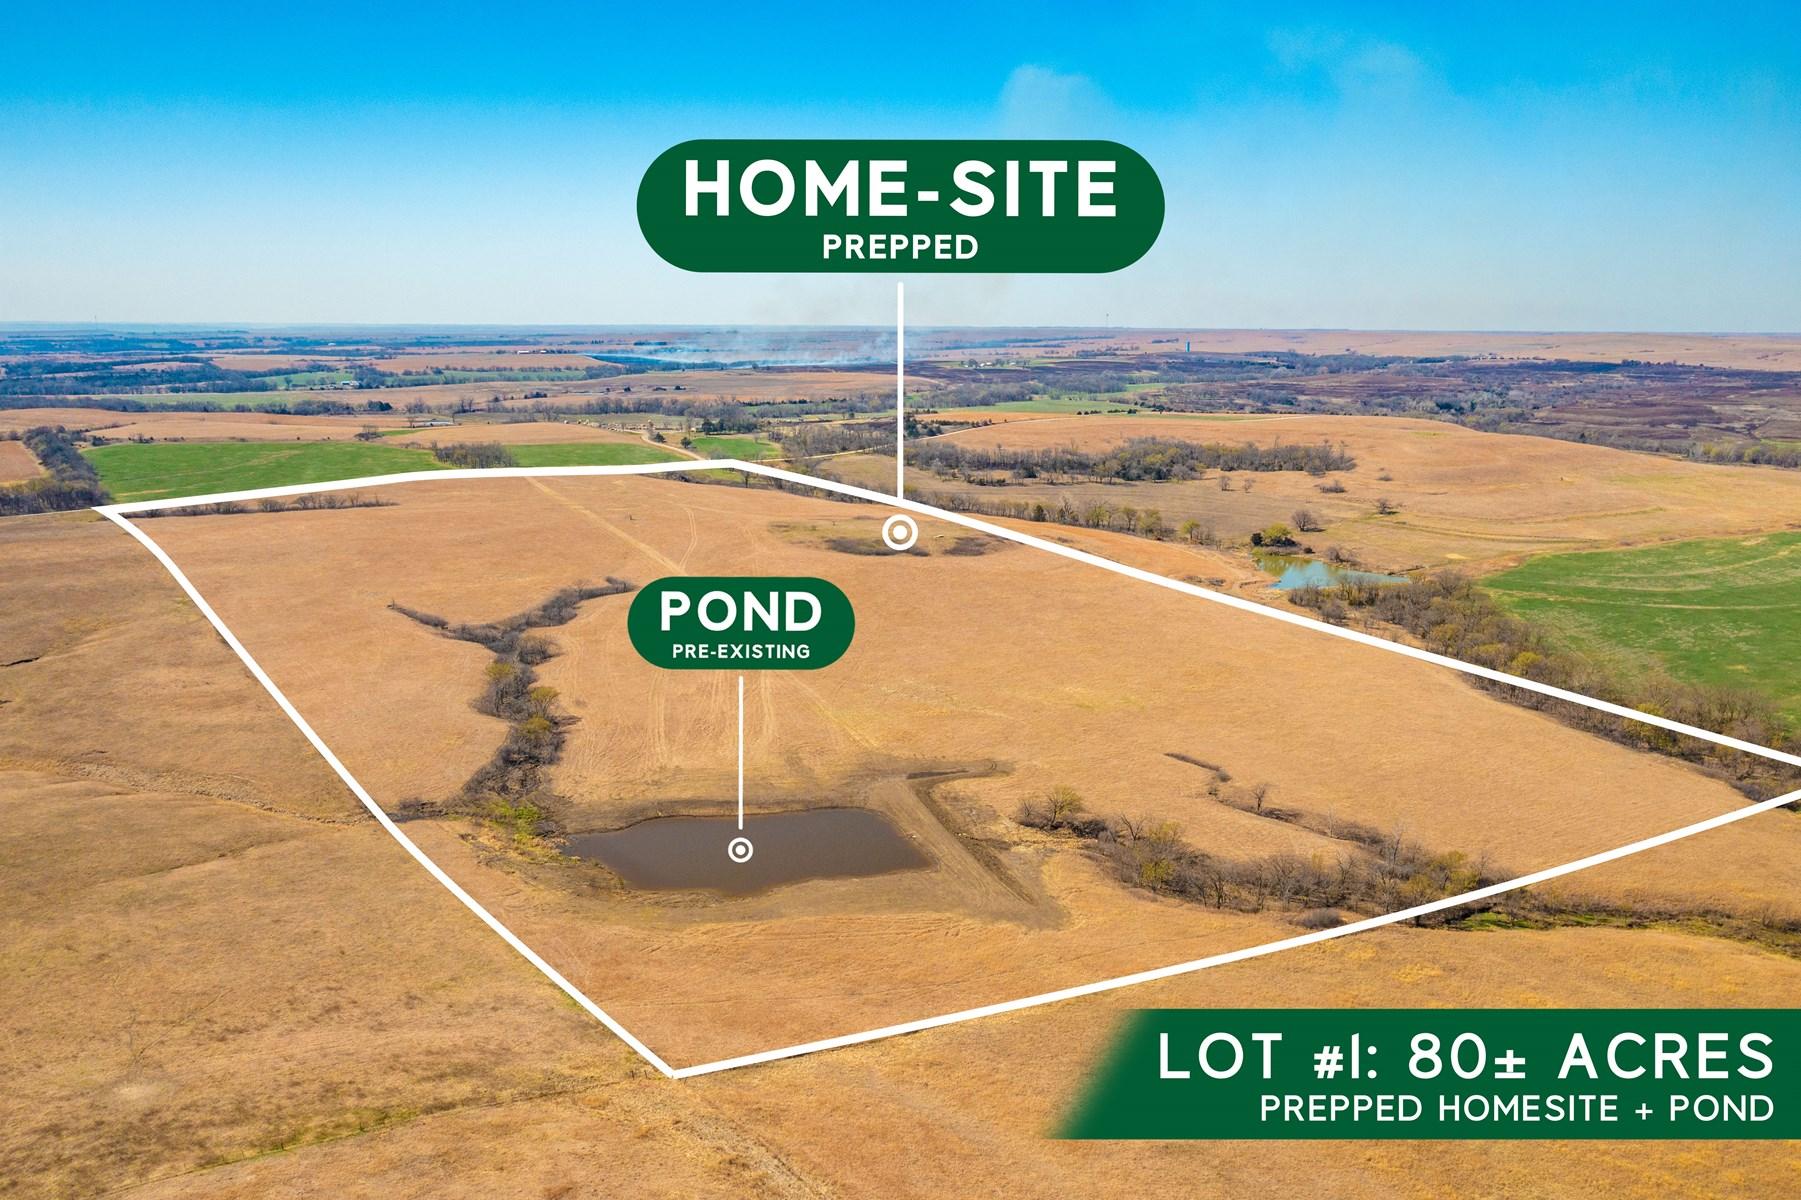 Kansas Land For Sale, Dream Home Build Site, Ranchette